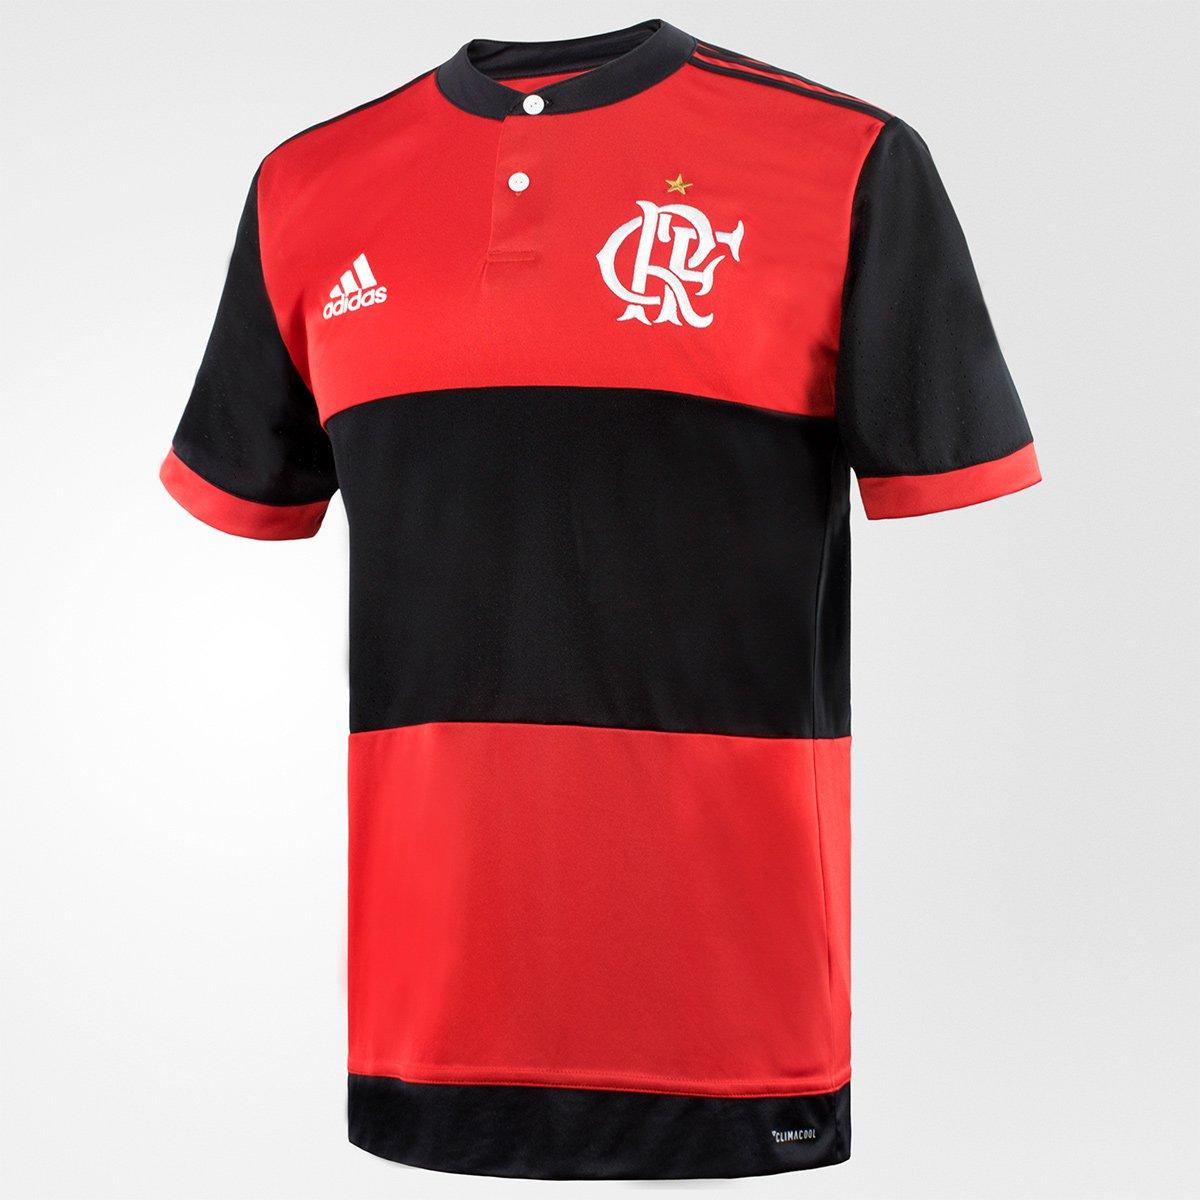 25c3242ea Camisa Flamengo I 17/18 N° 10 - Diego Torcedor Adidas Masculina | Netshoes